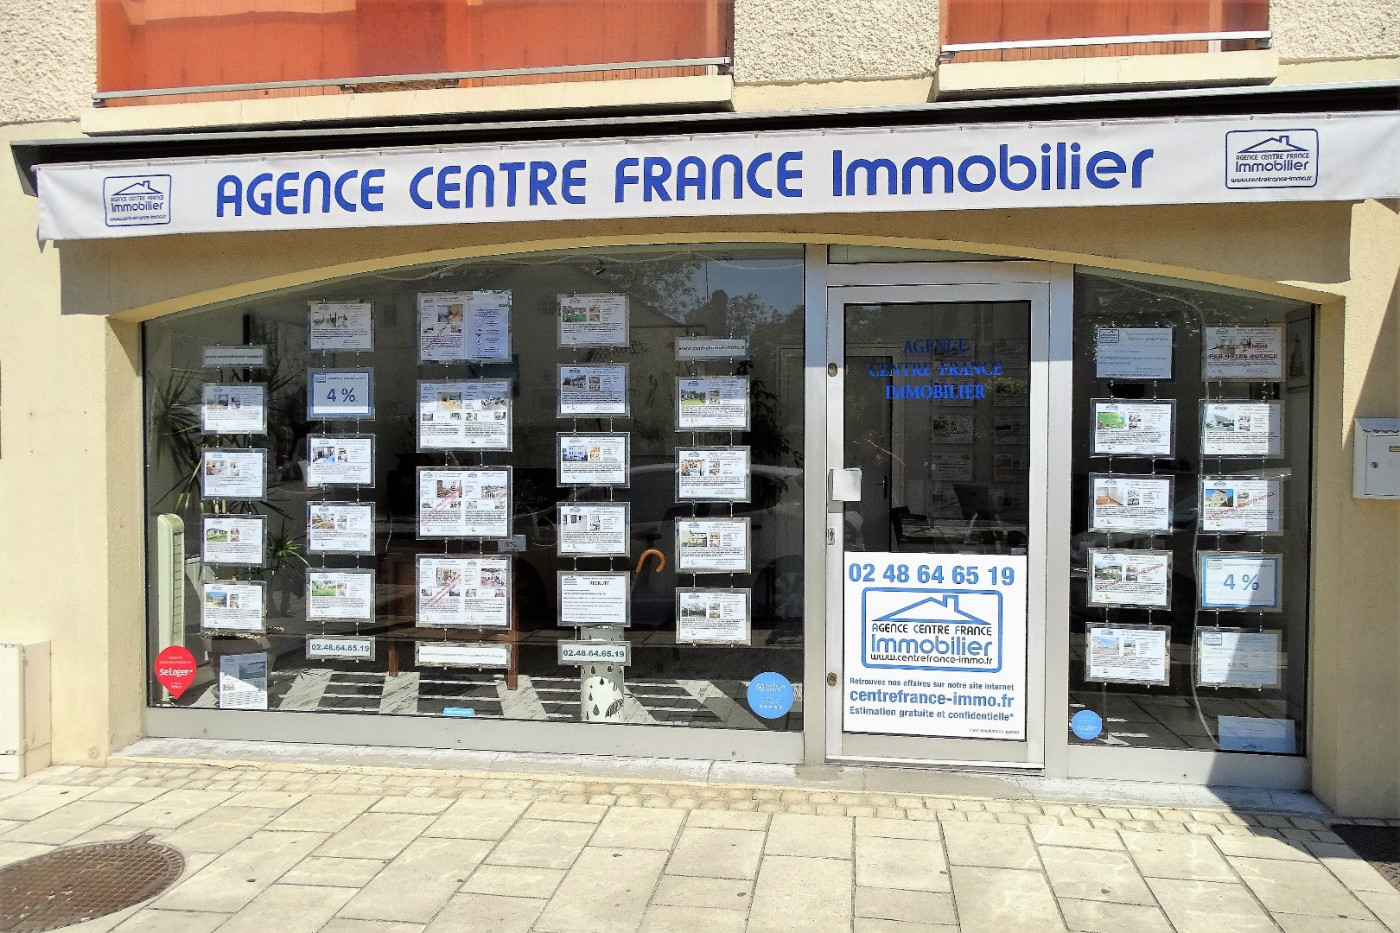 A vendre  Bourges | Réf 030011502 - Agence centre france immobilier